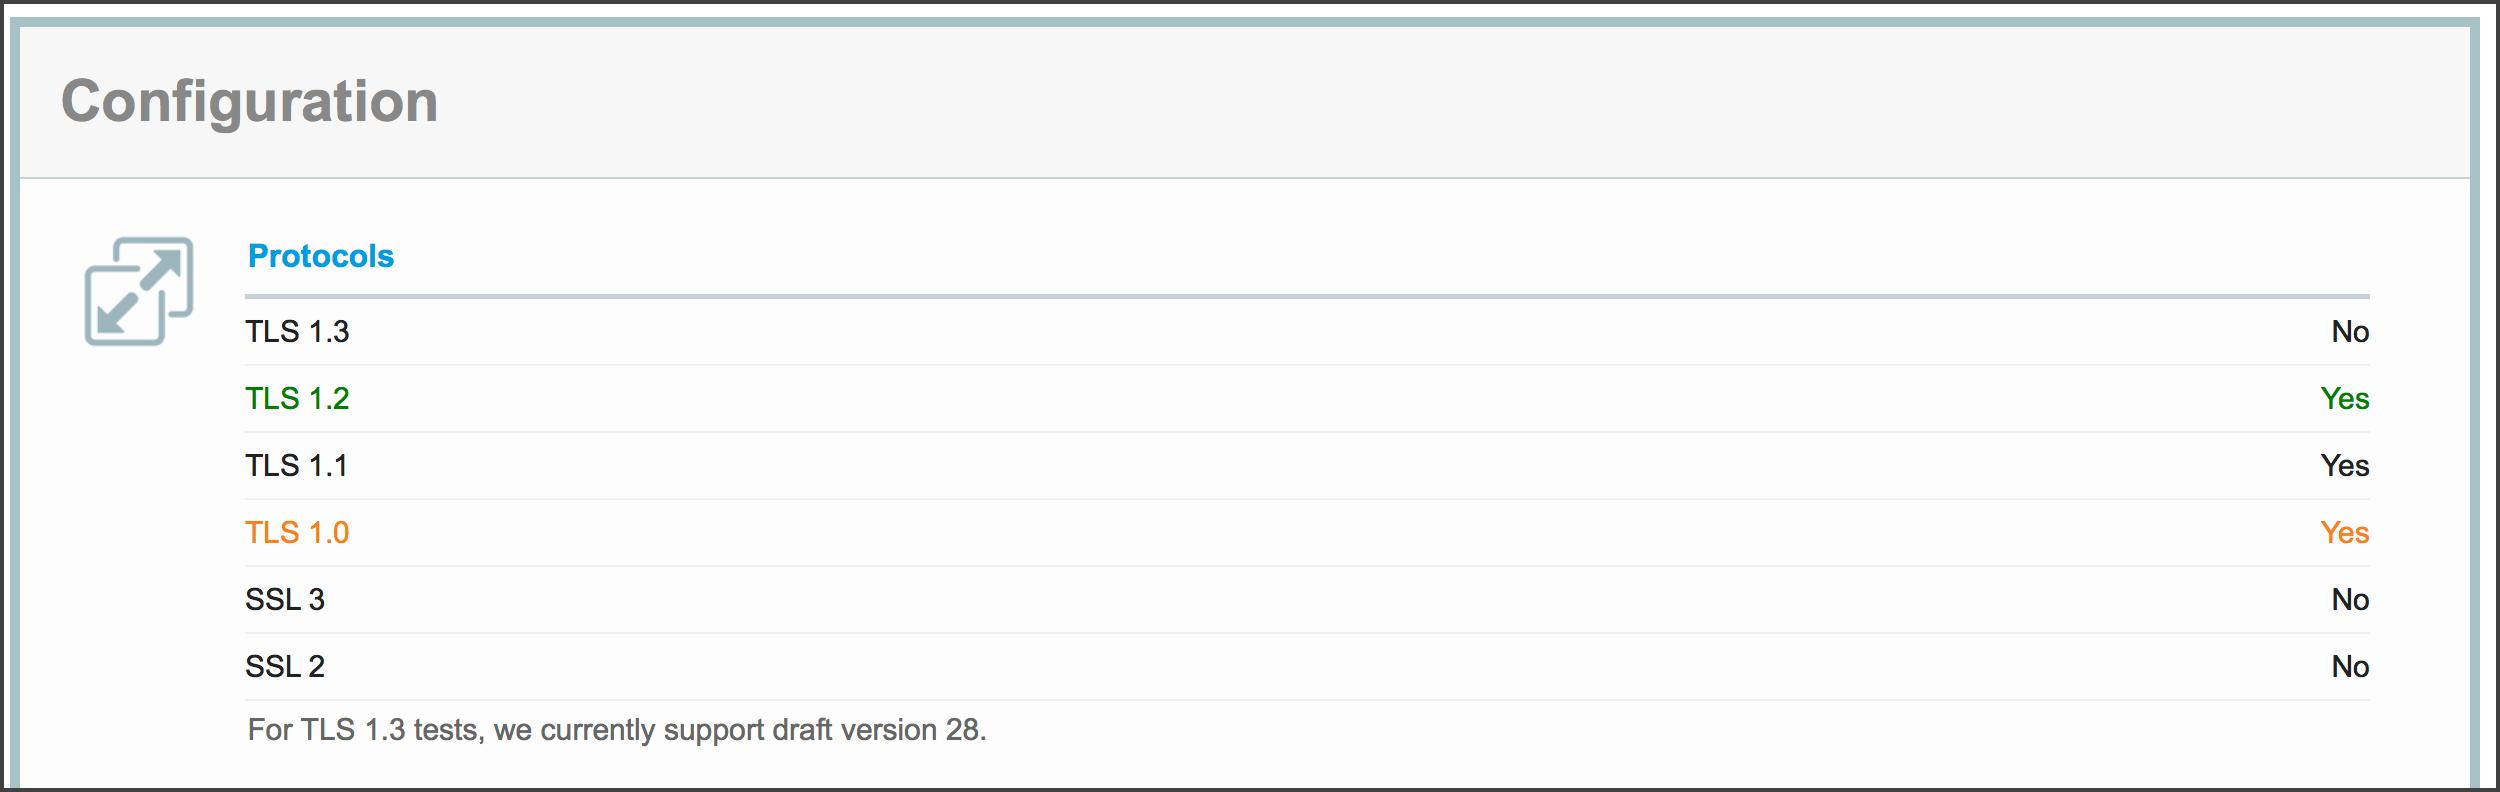 TLS 버전별 지원 여부 테이블